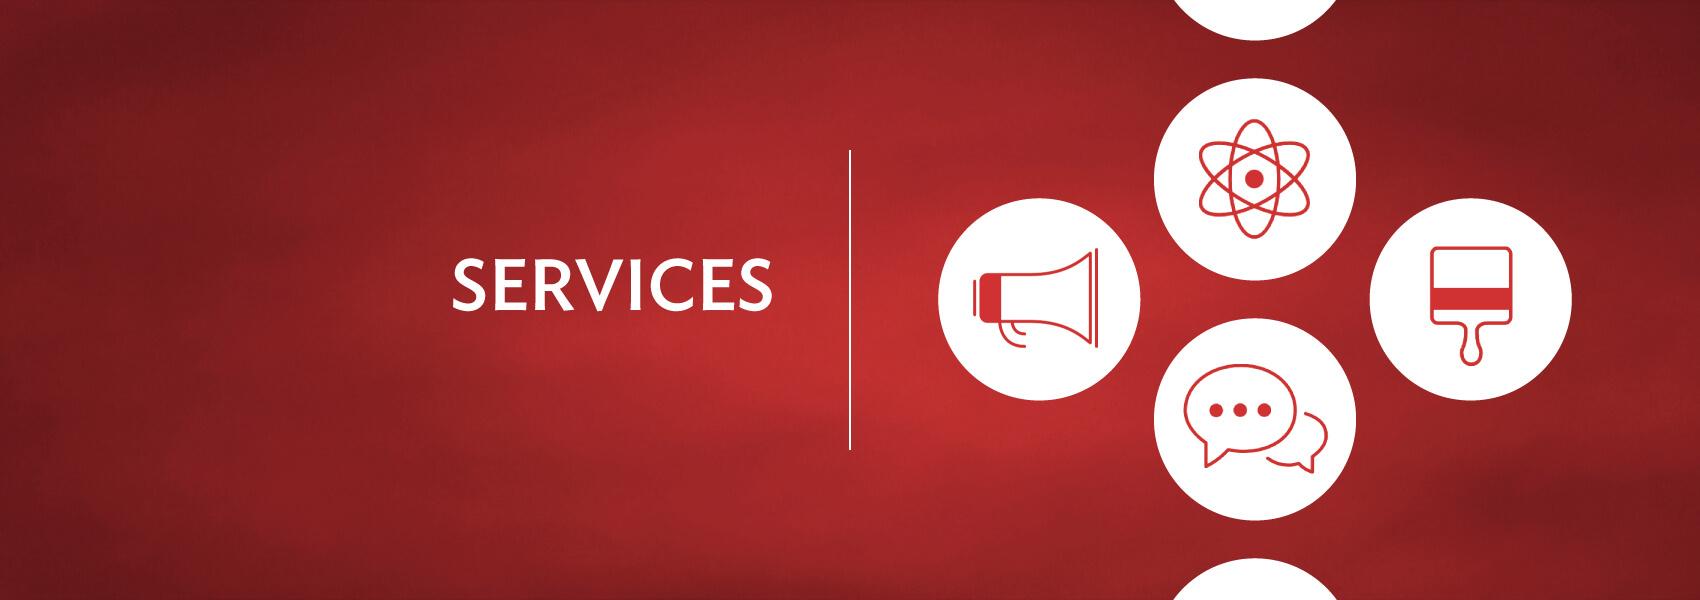 Merlot Marketing services